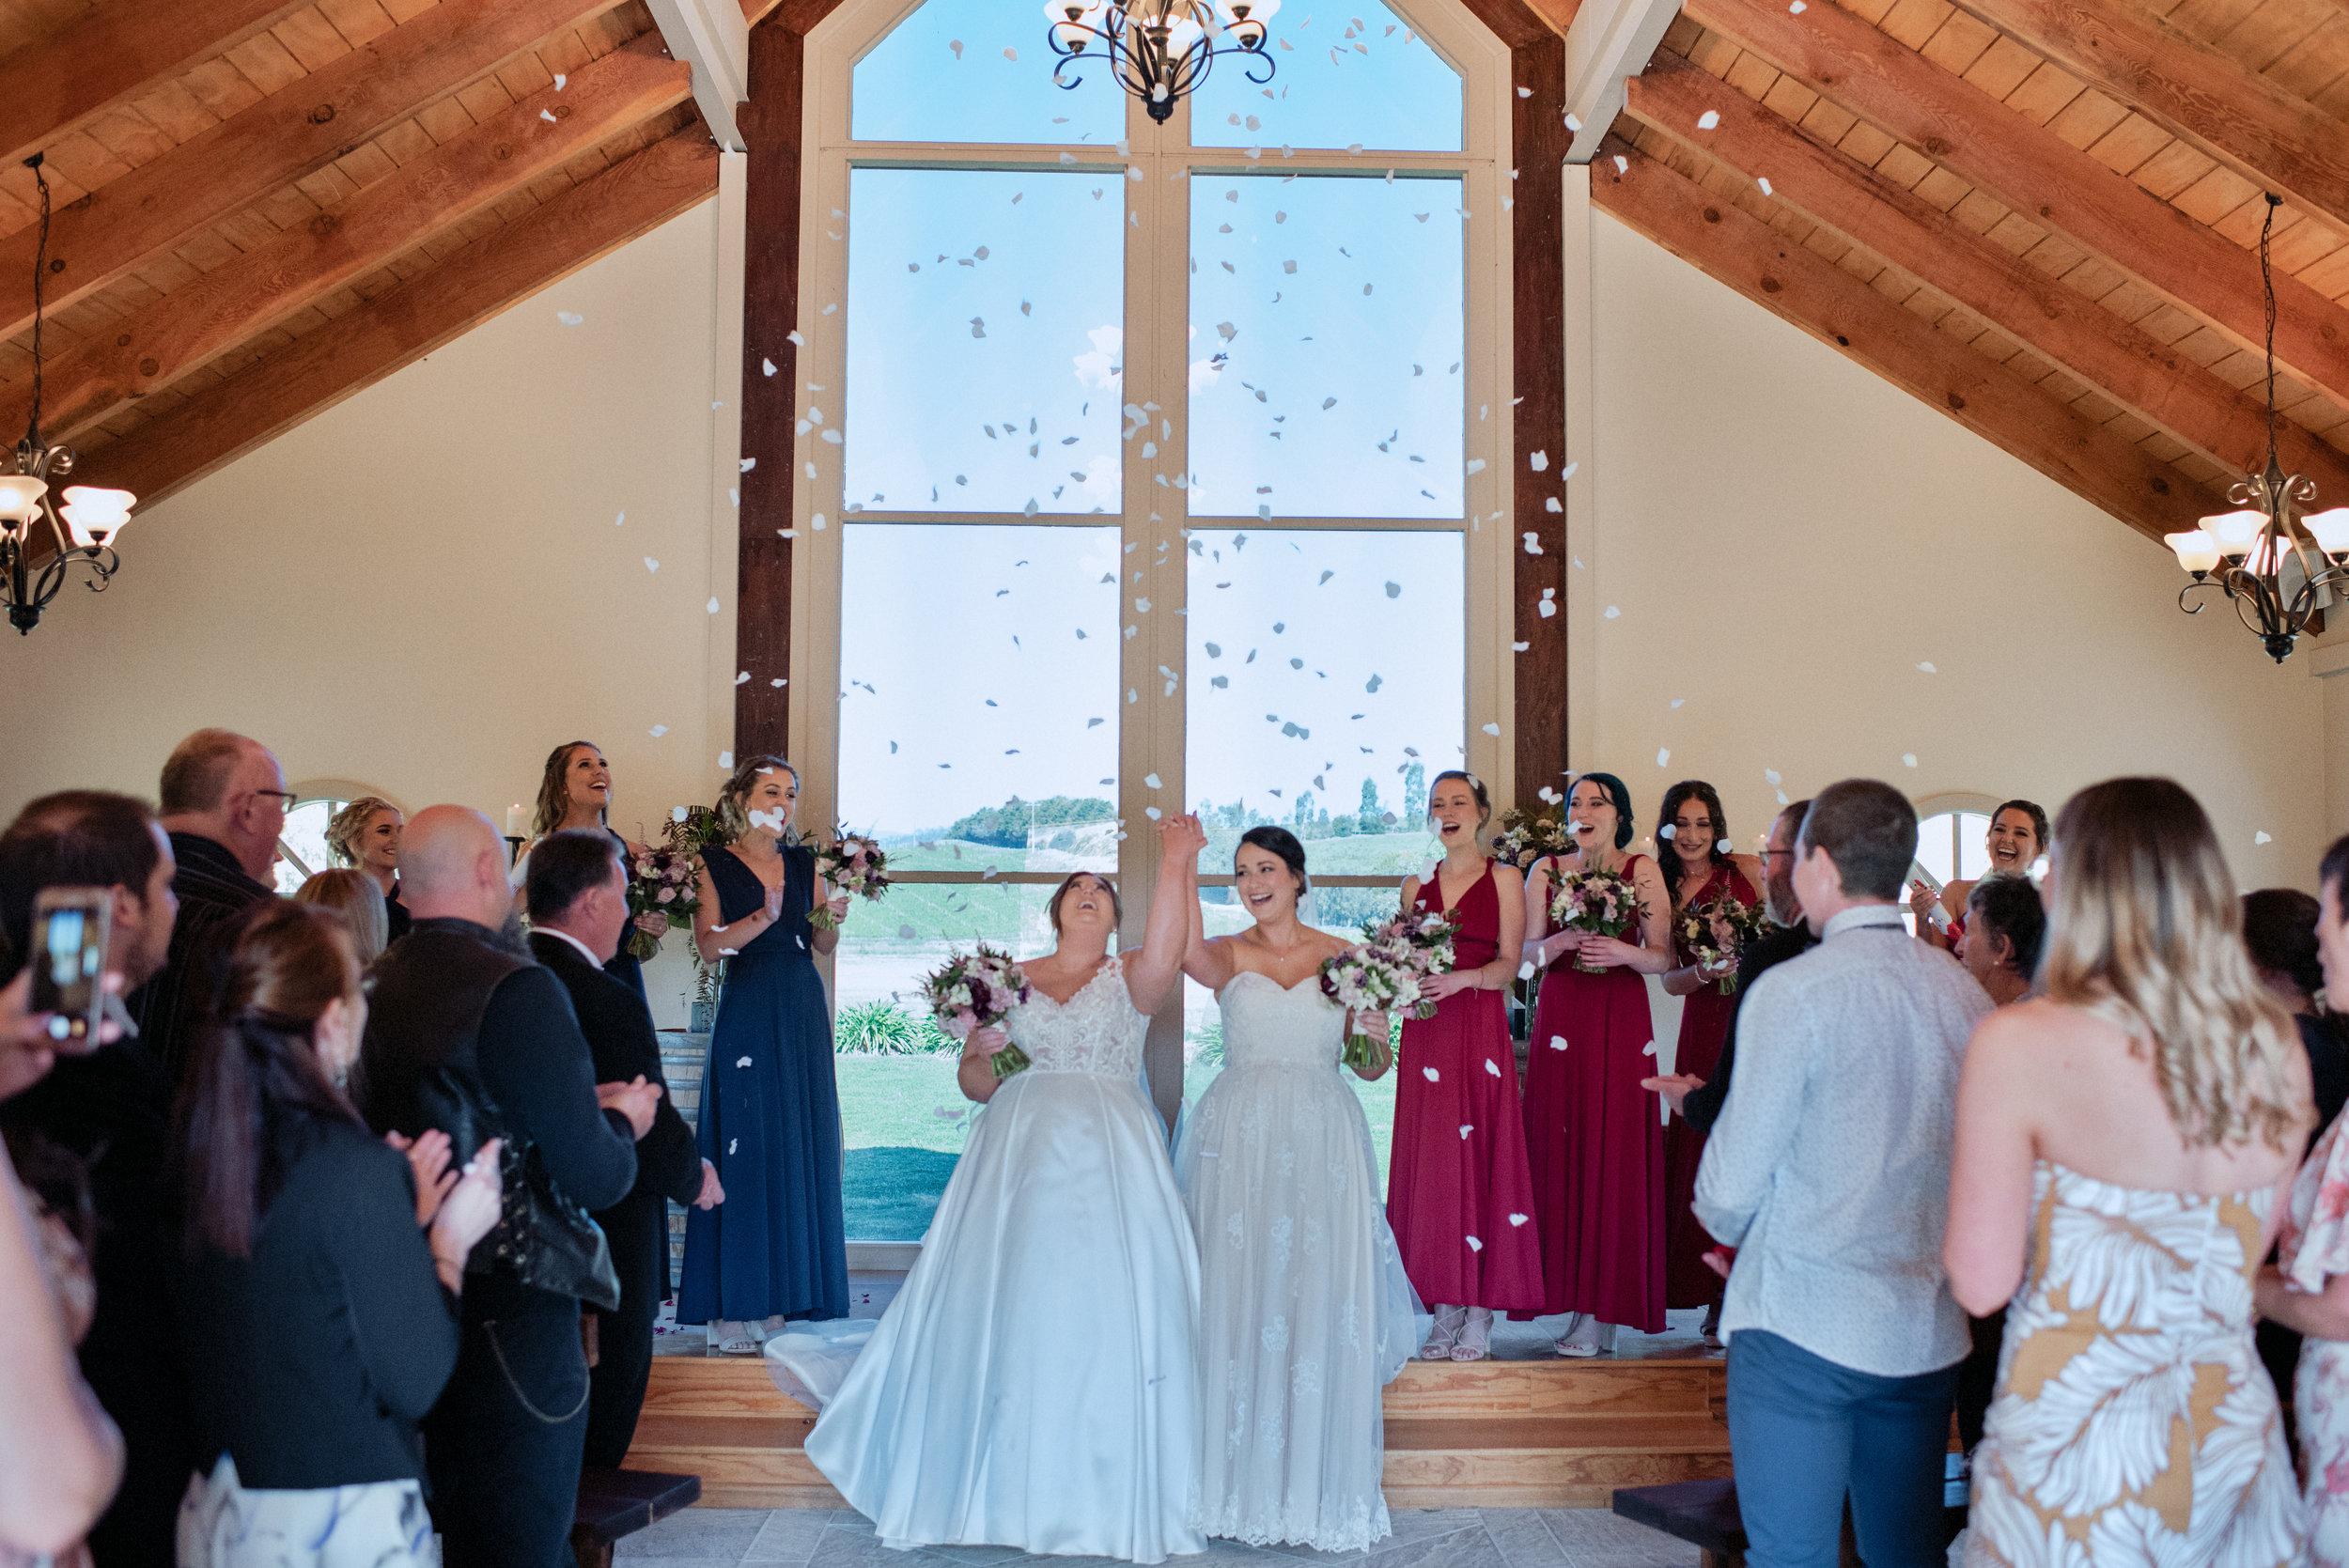 20181028_Abbey_Kate_Wedding-487-Edit-9.jpg